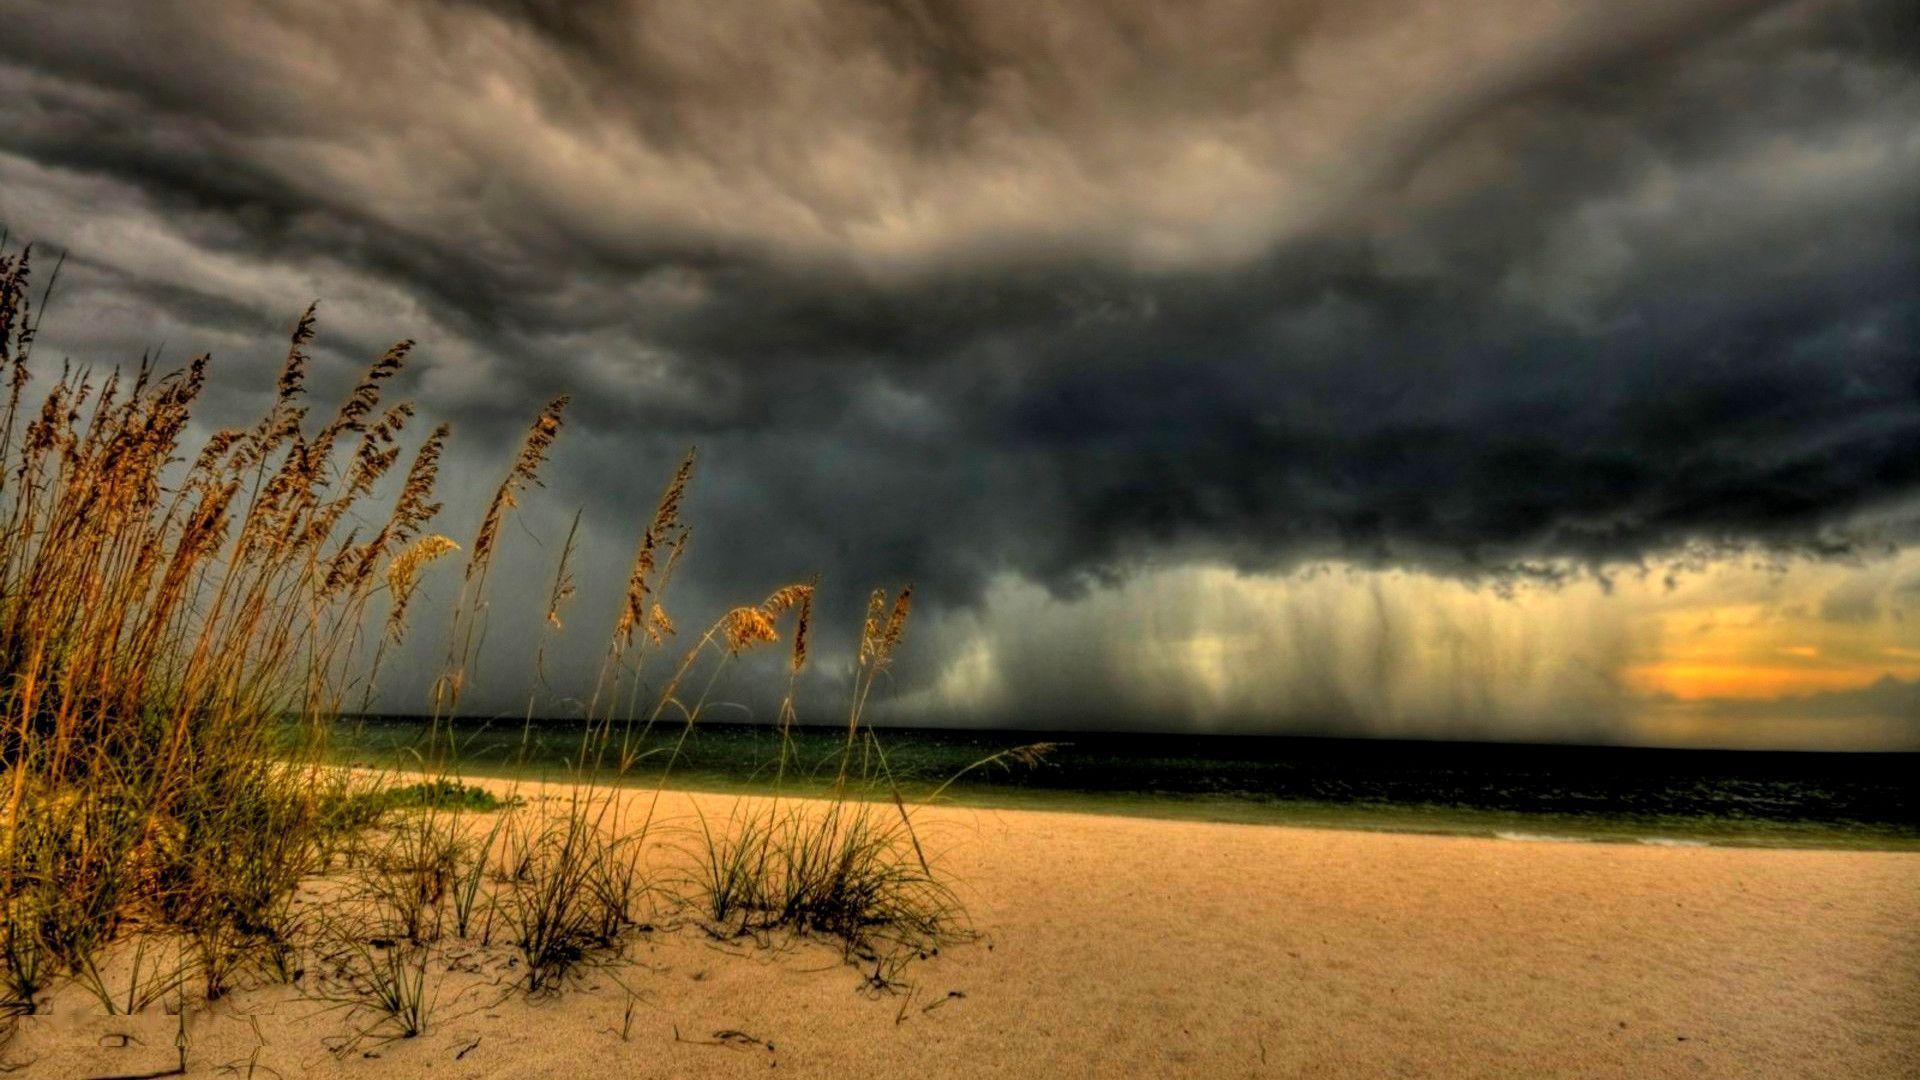 Beach Thunderstorm Wallpaper: Thunderstorm Backgrounds